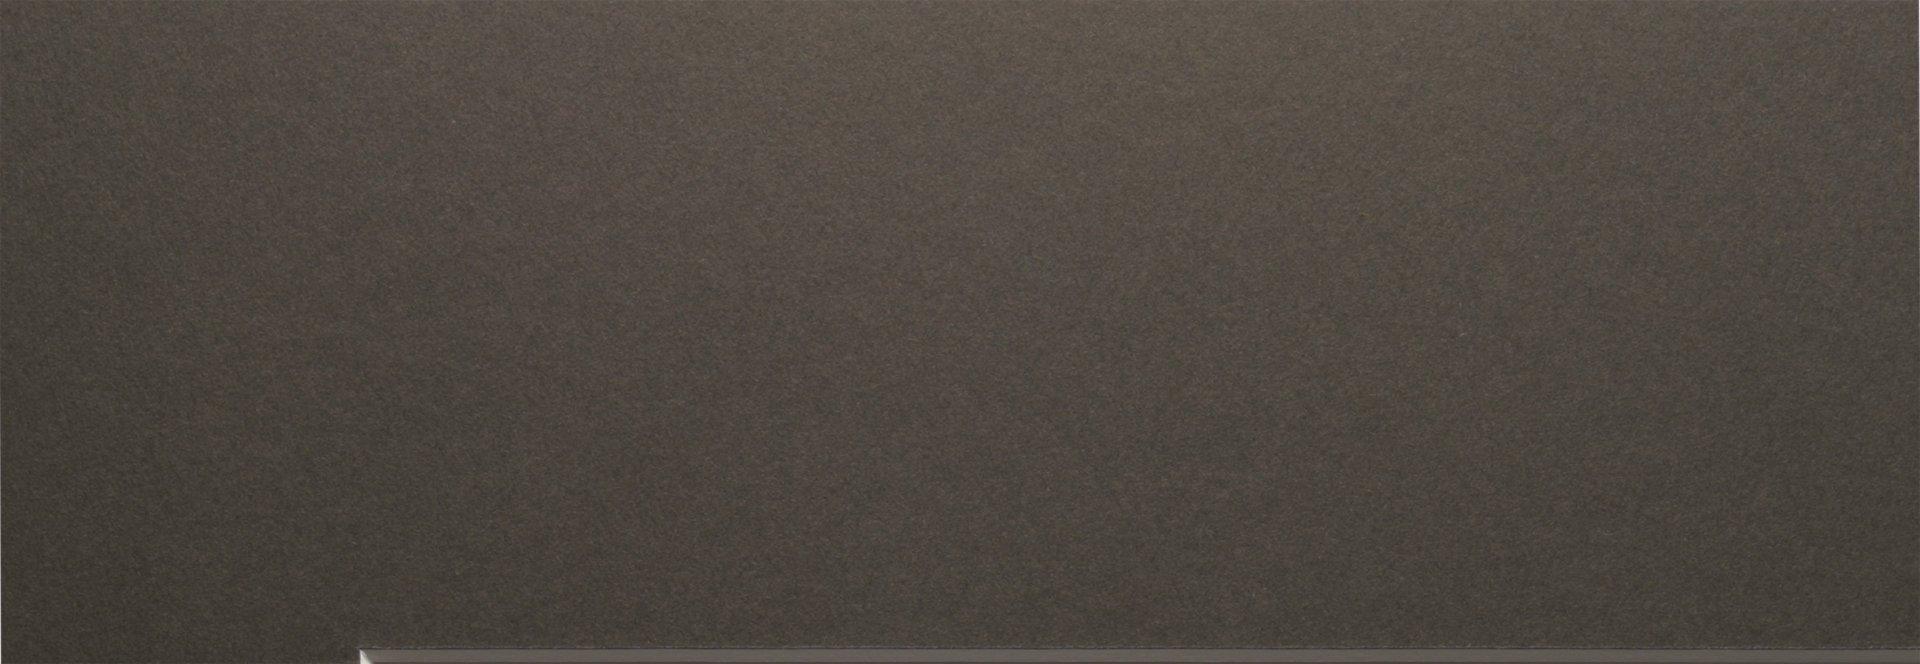 SRM 1033 Dark Ash